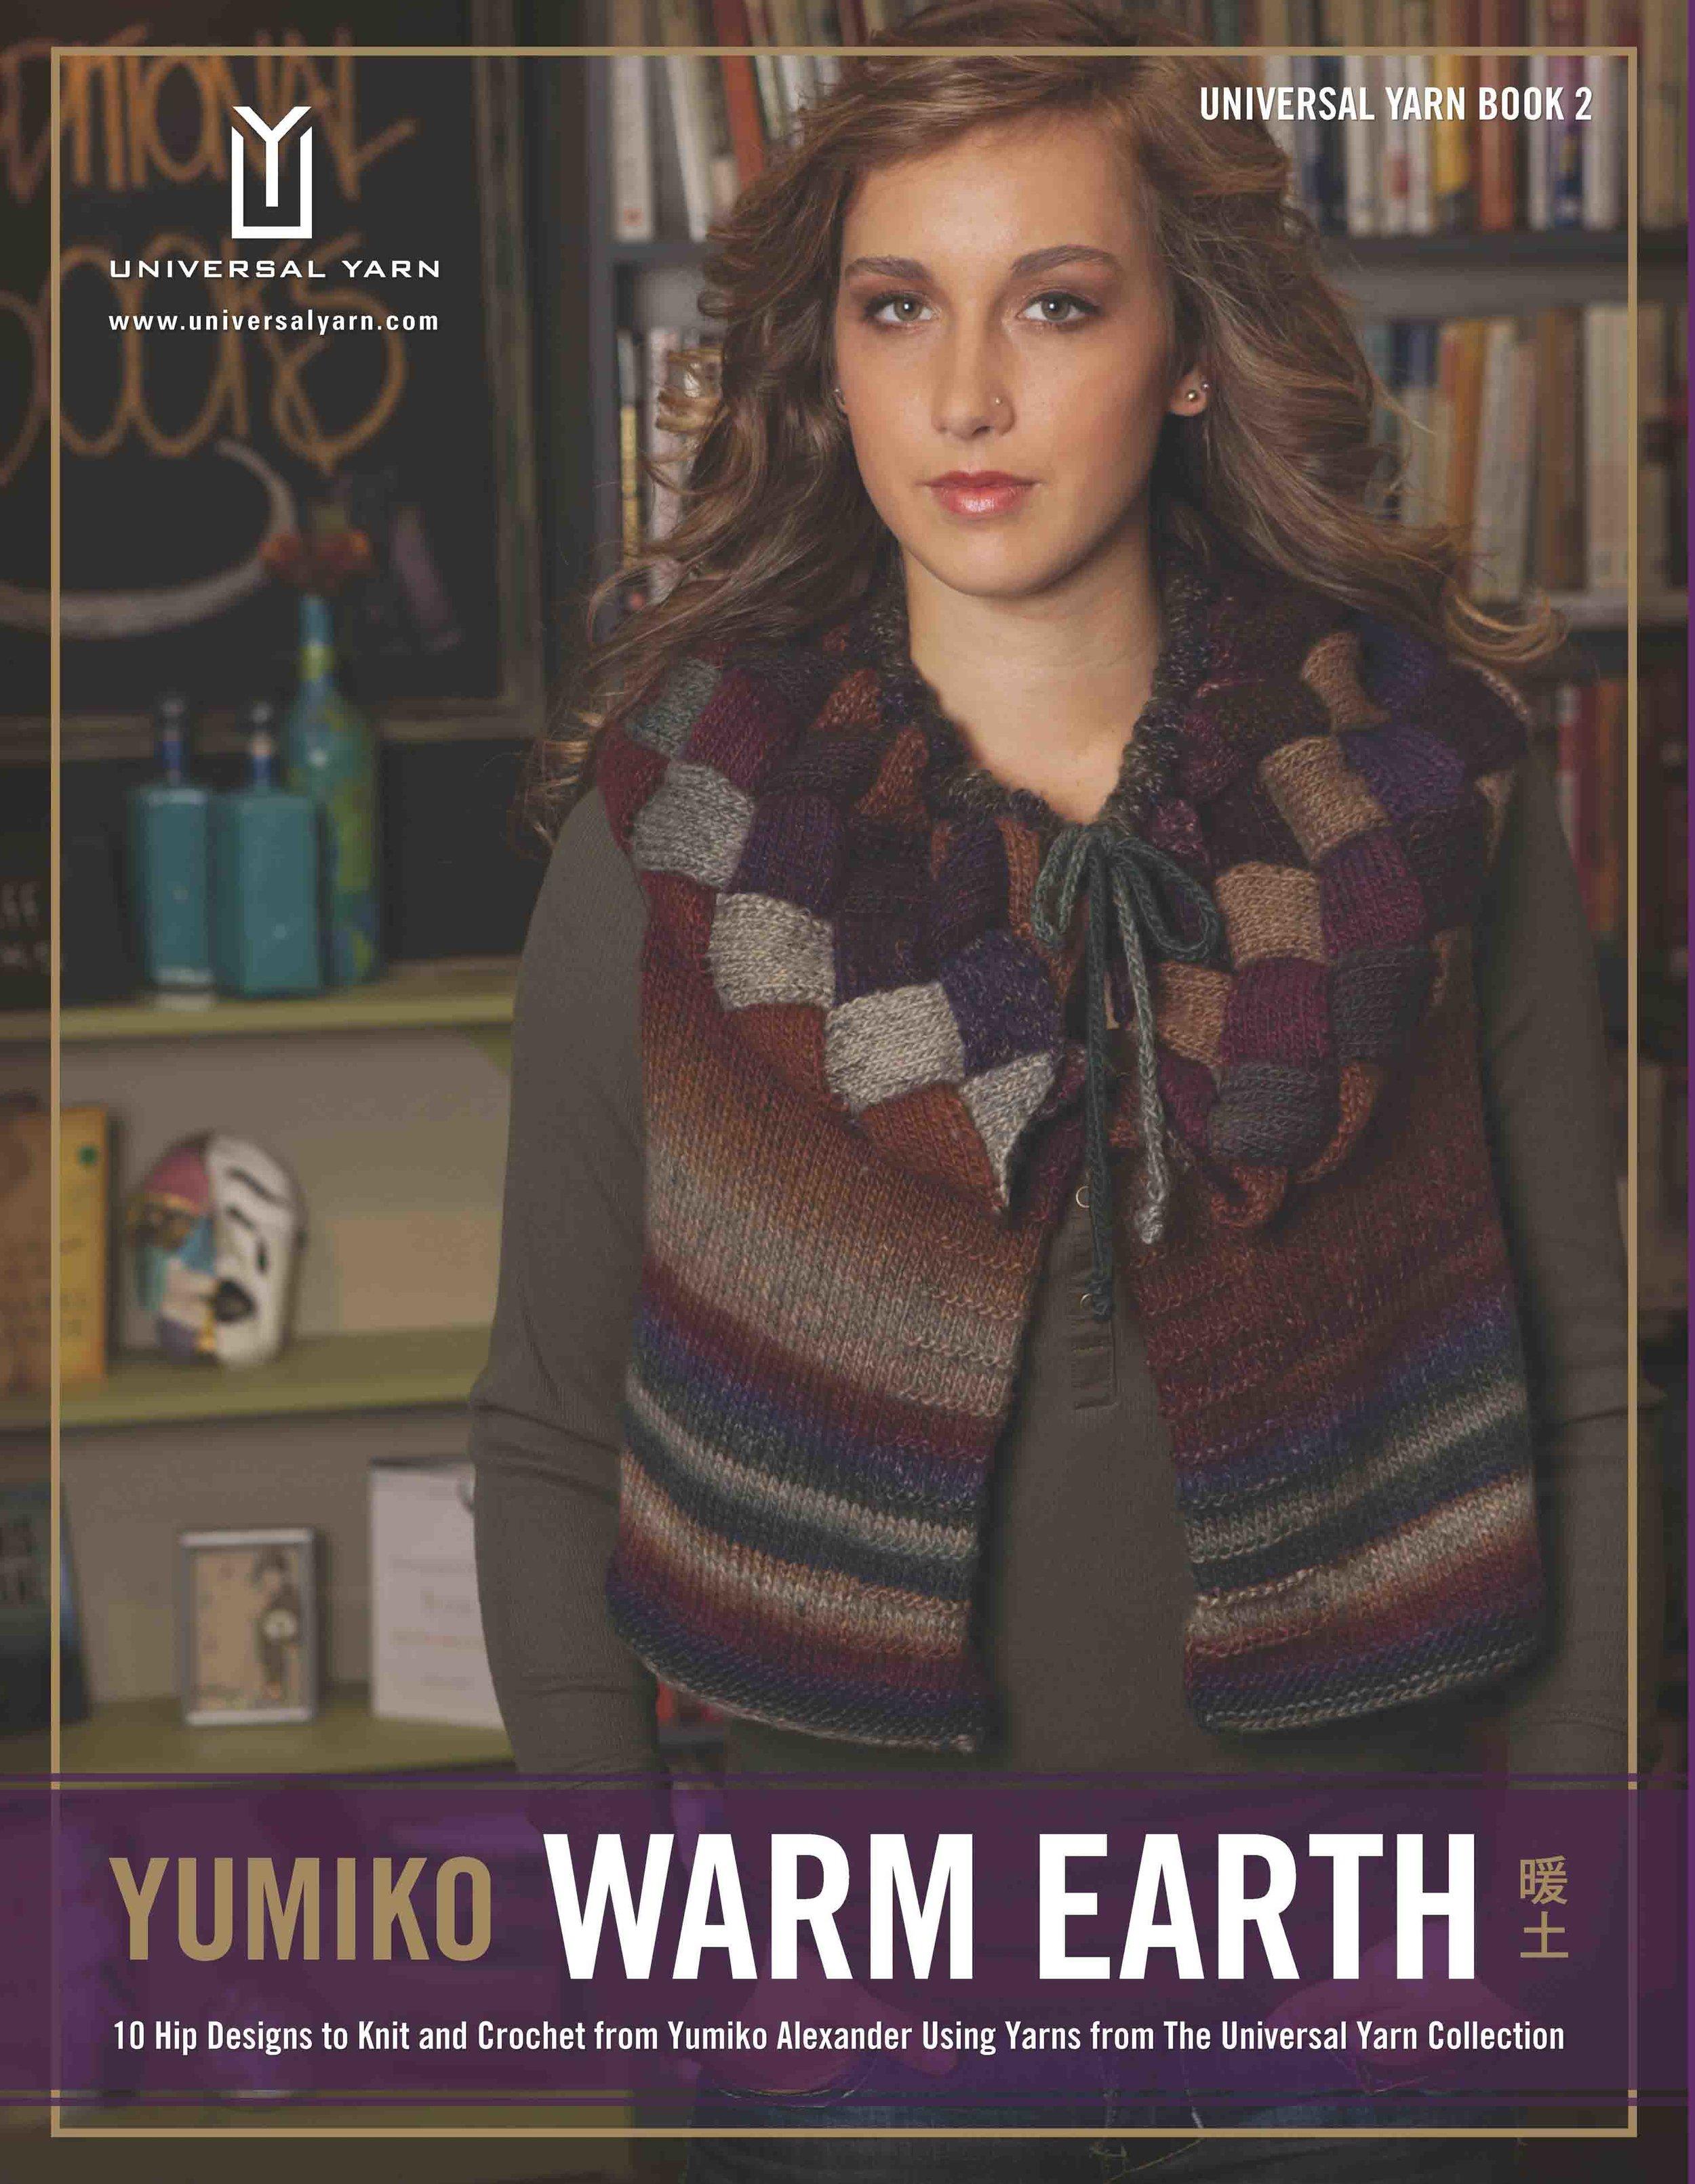 Yumiko Warm Earth 2 (2011)